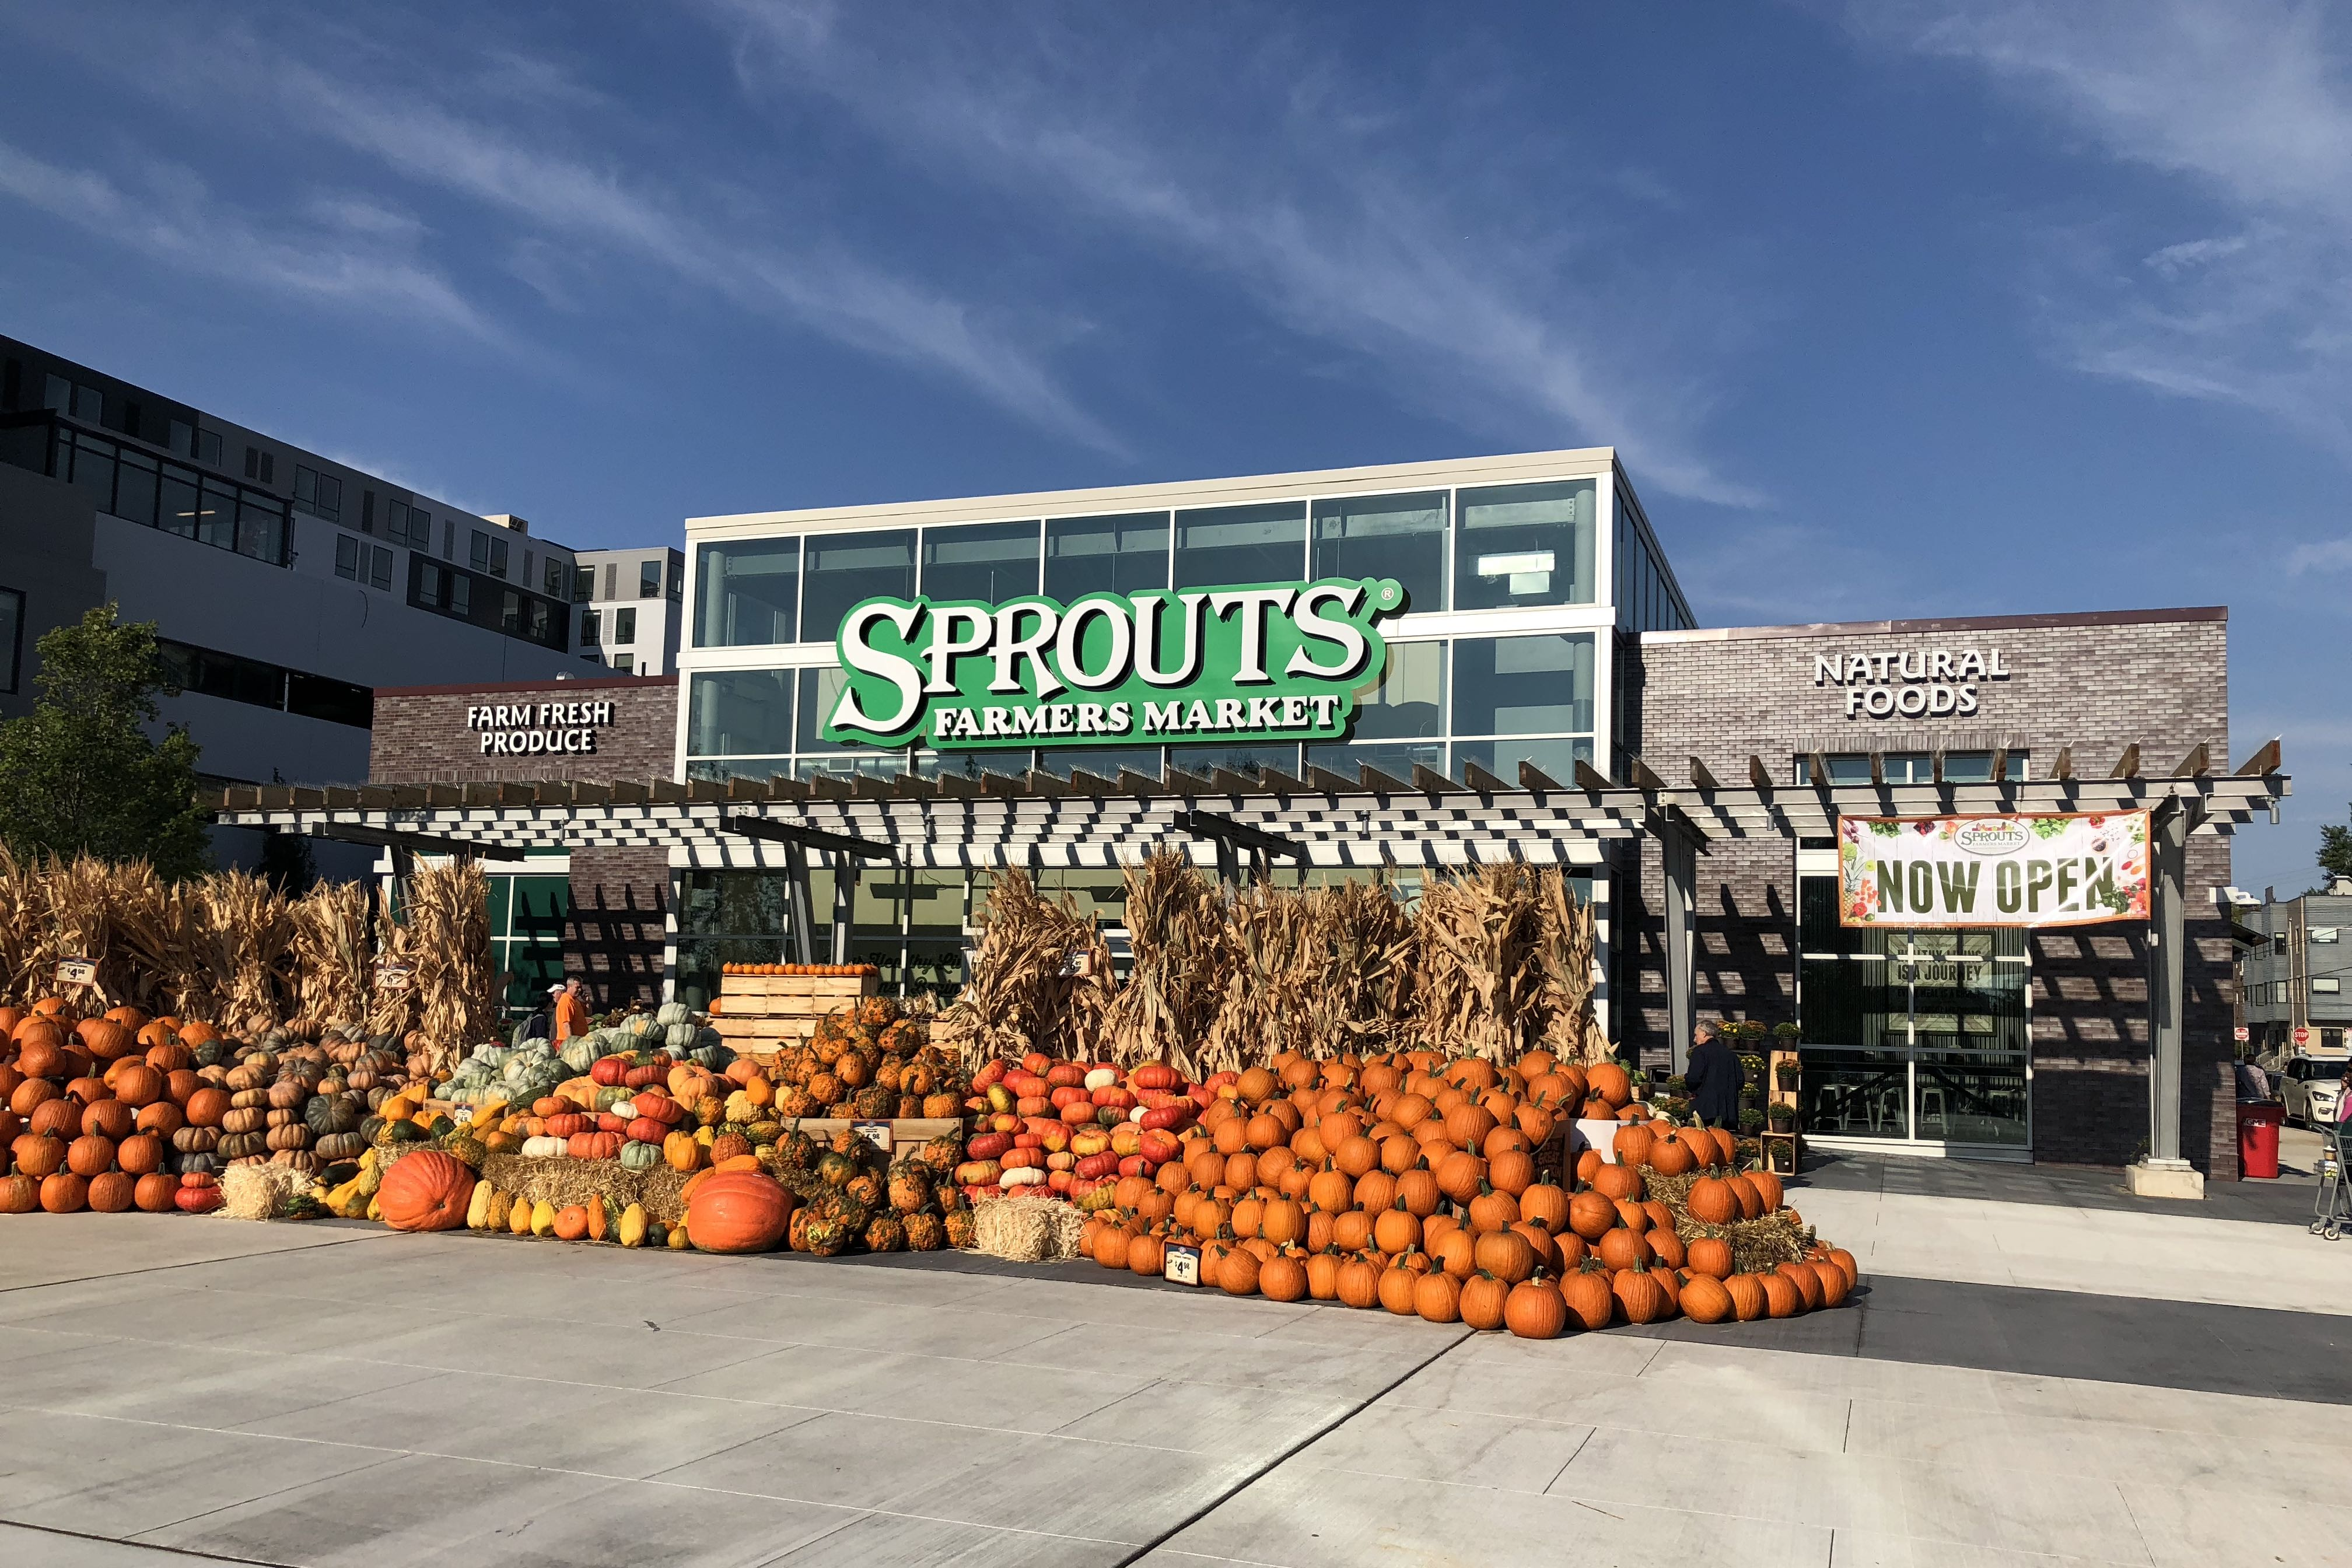 sprouts-farmers-market-broad-street